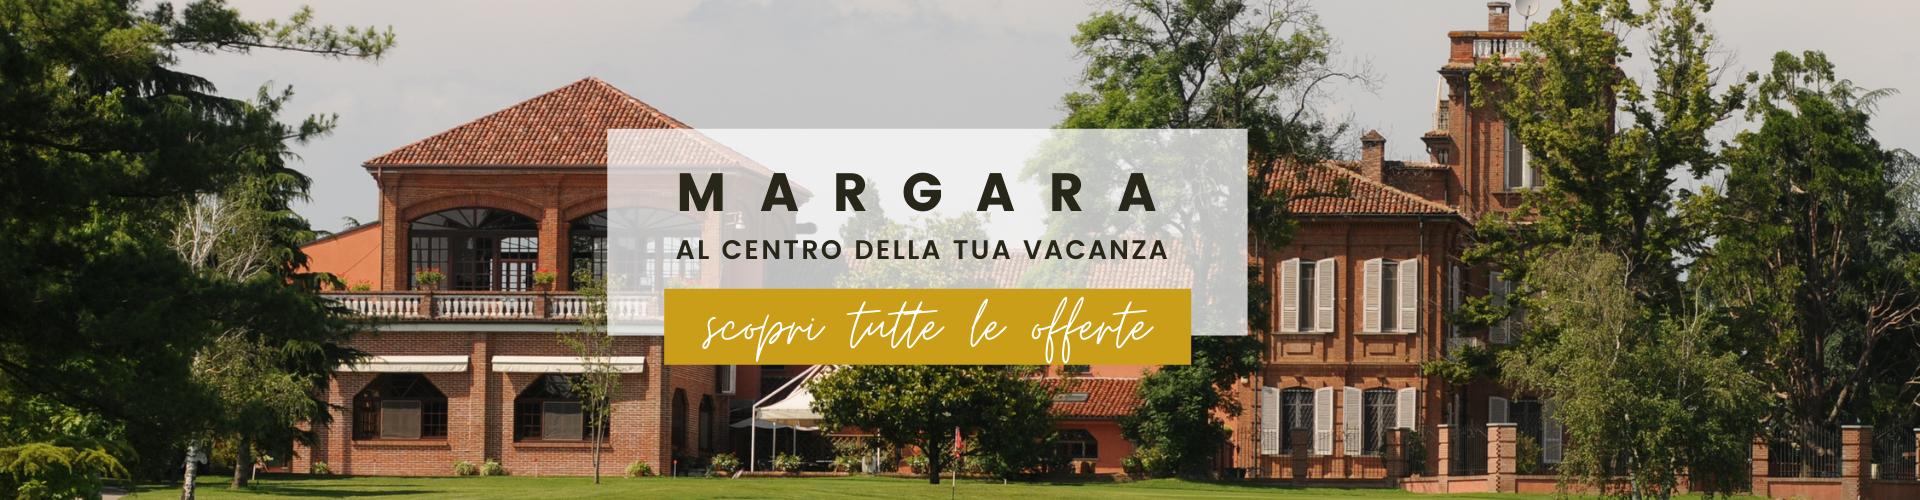 Banner offerte vacanze golf margara